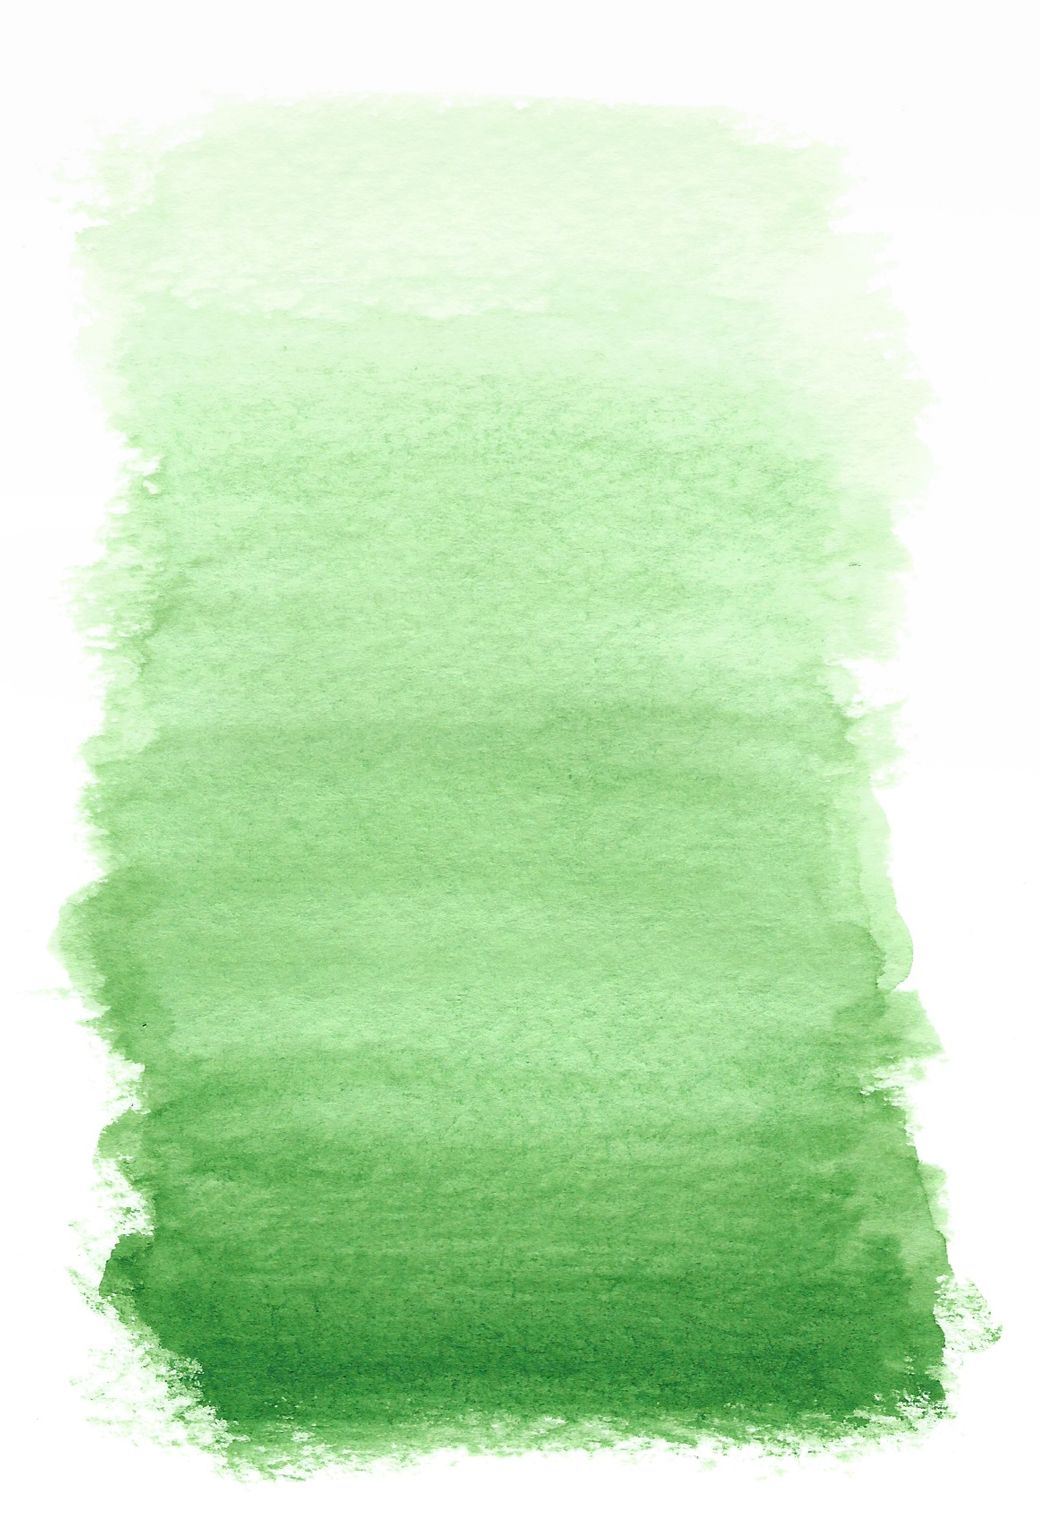 Green Watercolor iPhone Wallpaper PanPins Green